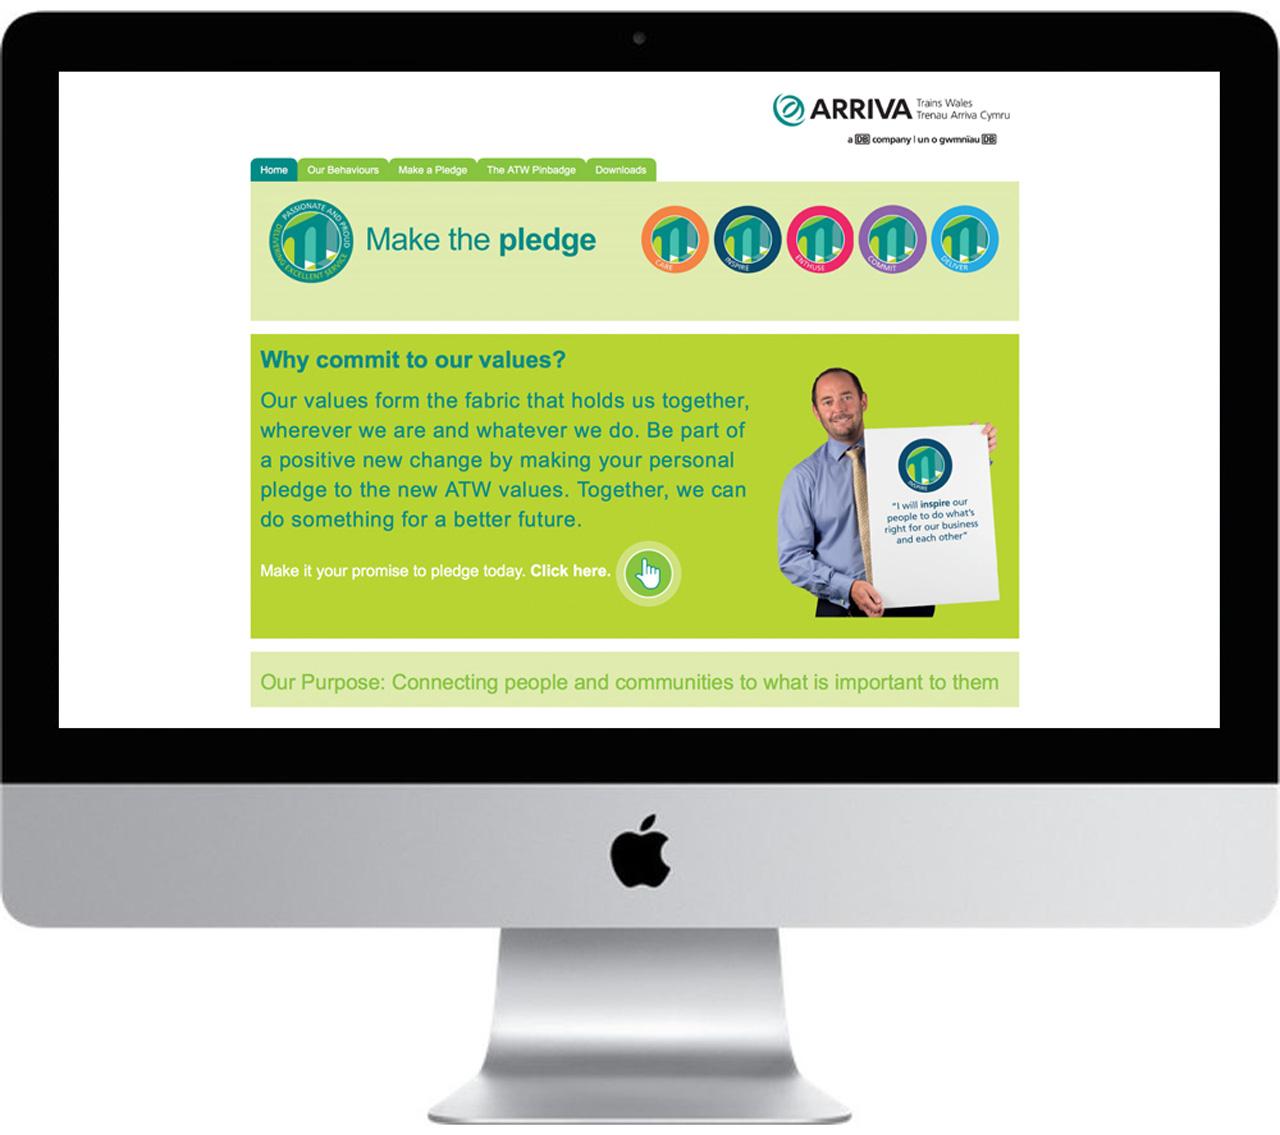 ATW make the pledge website internal communications